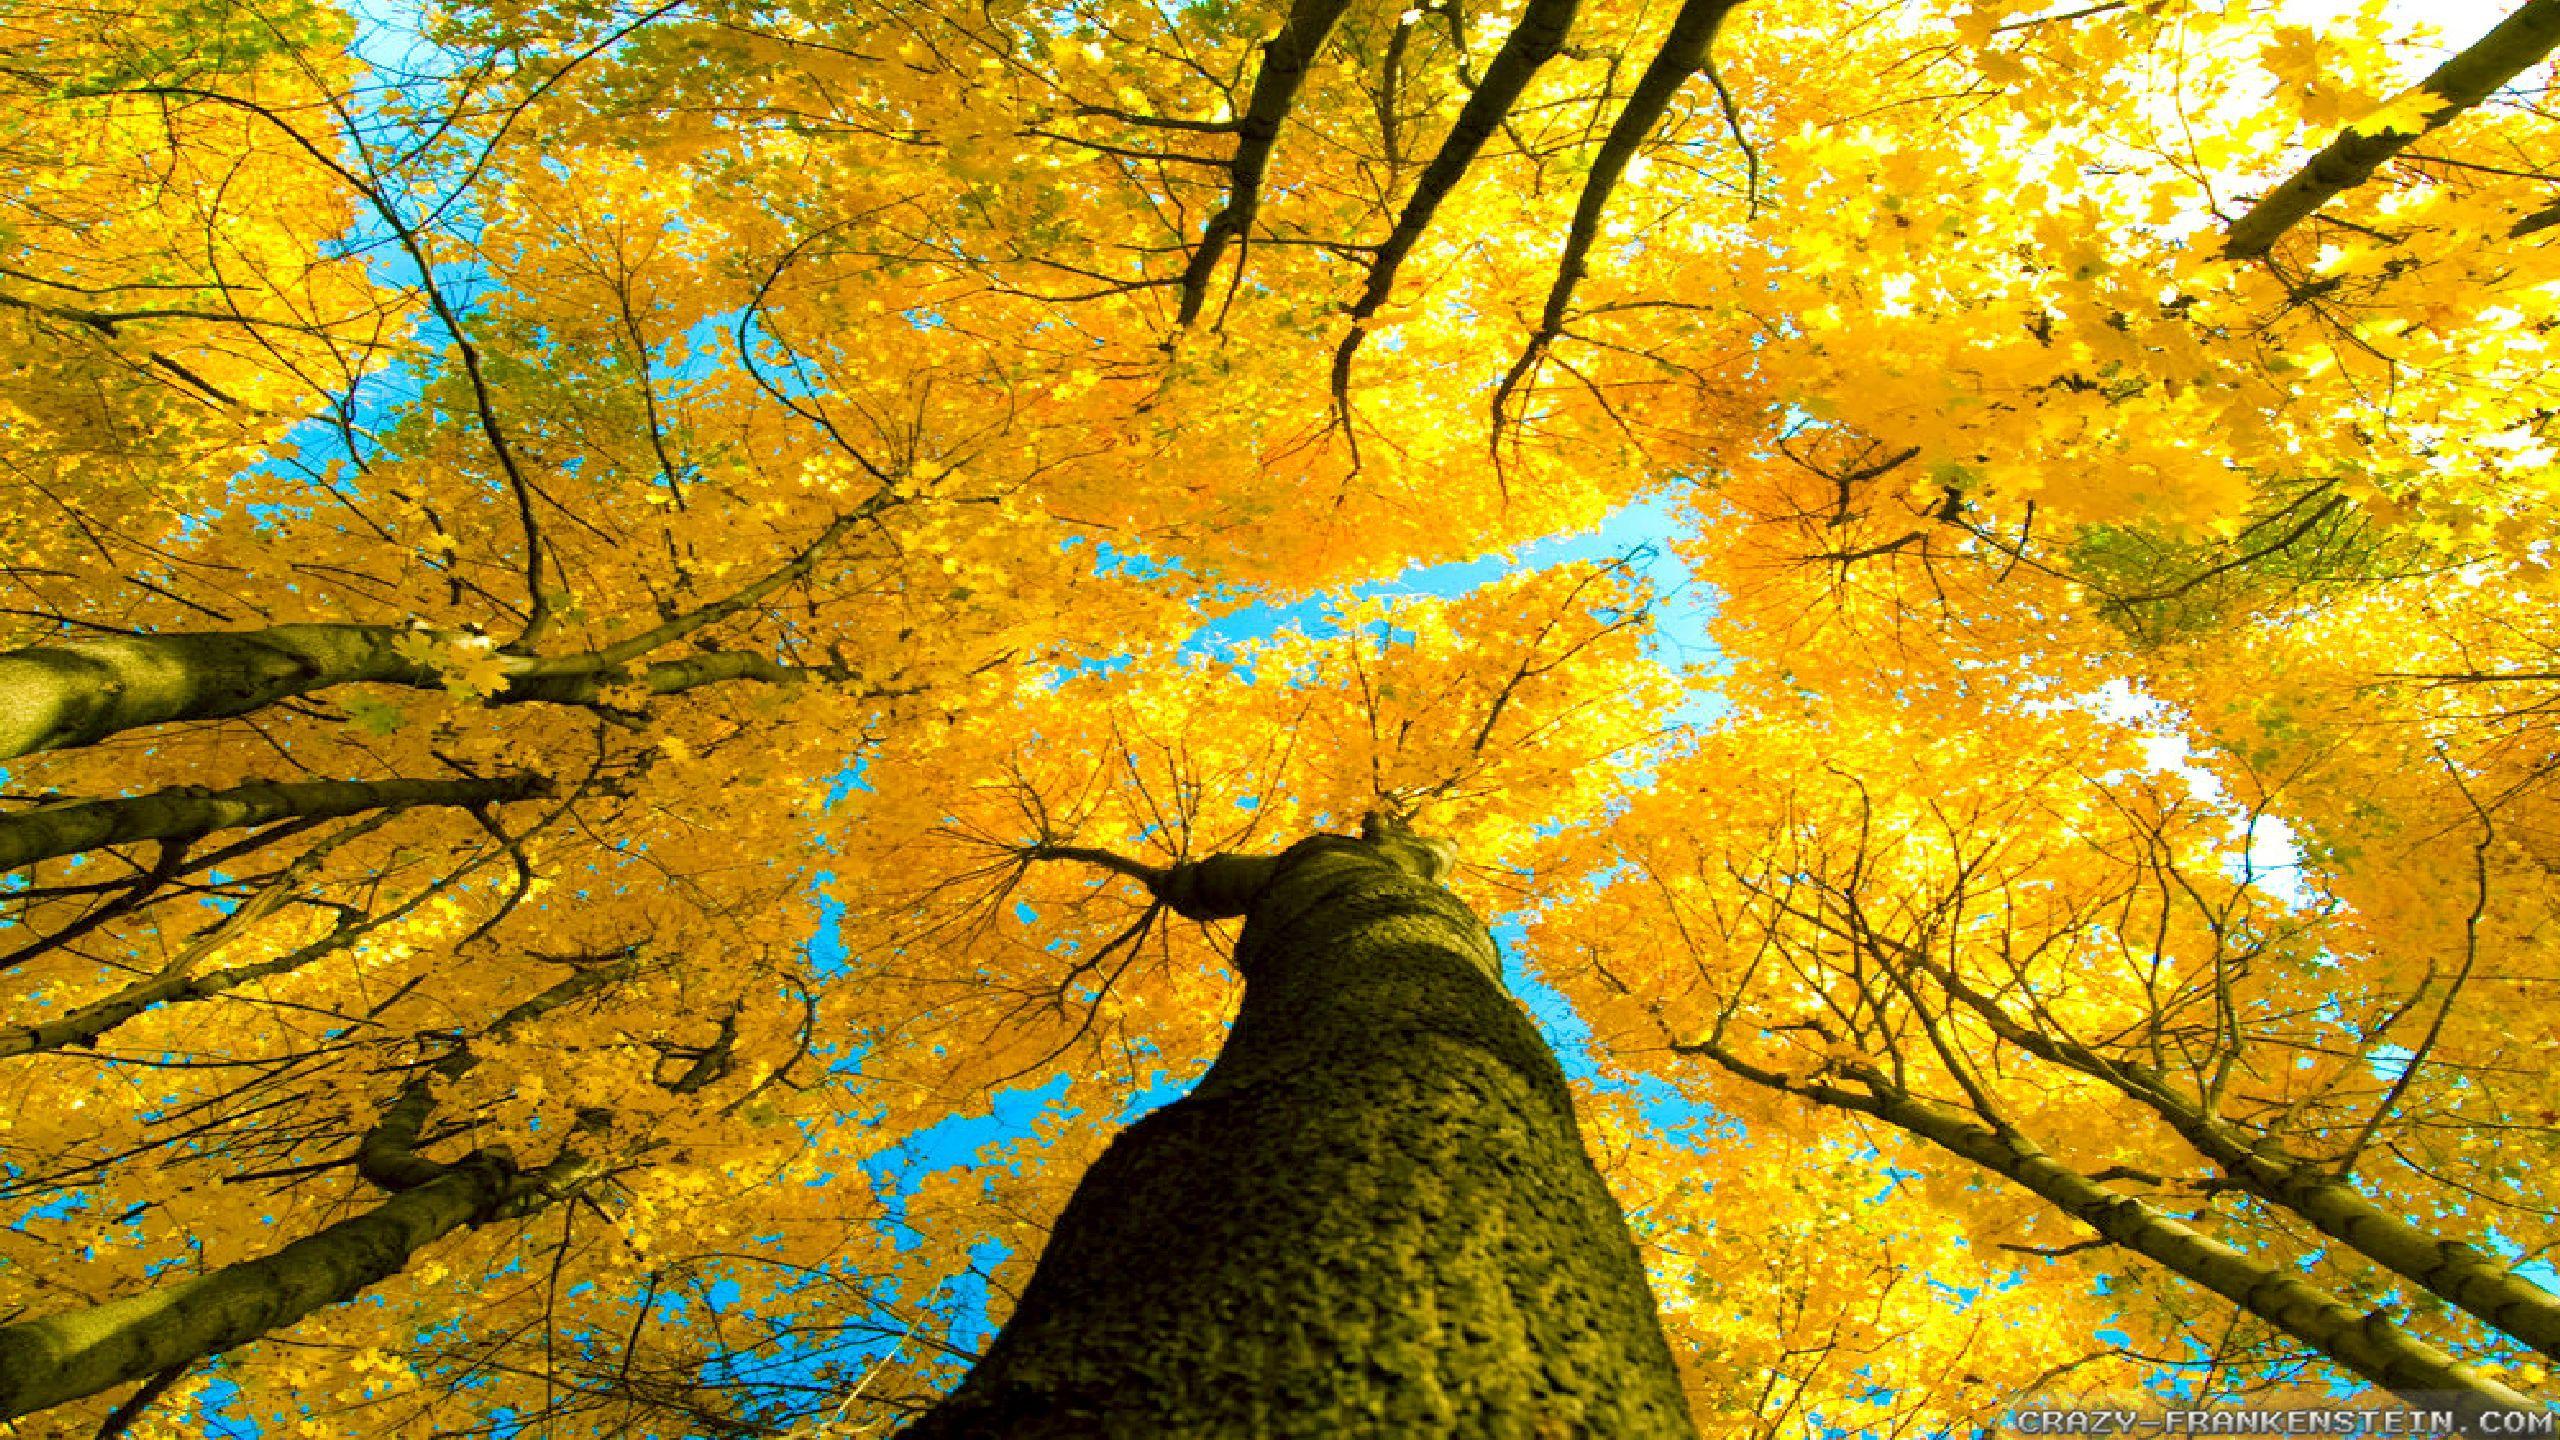 Autumn Sky Wallpaper Full Hd Is 4k Wallpaper 2560x1440 Download Hd Wallpaper Wallpapertip